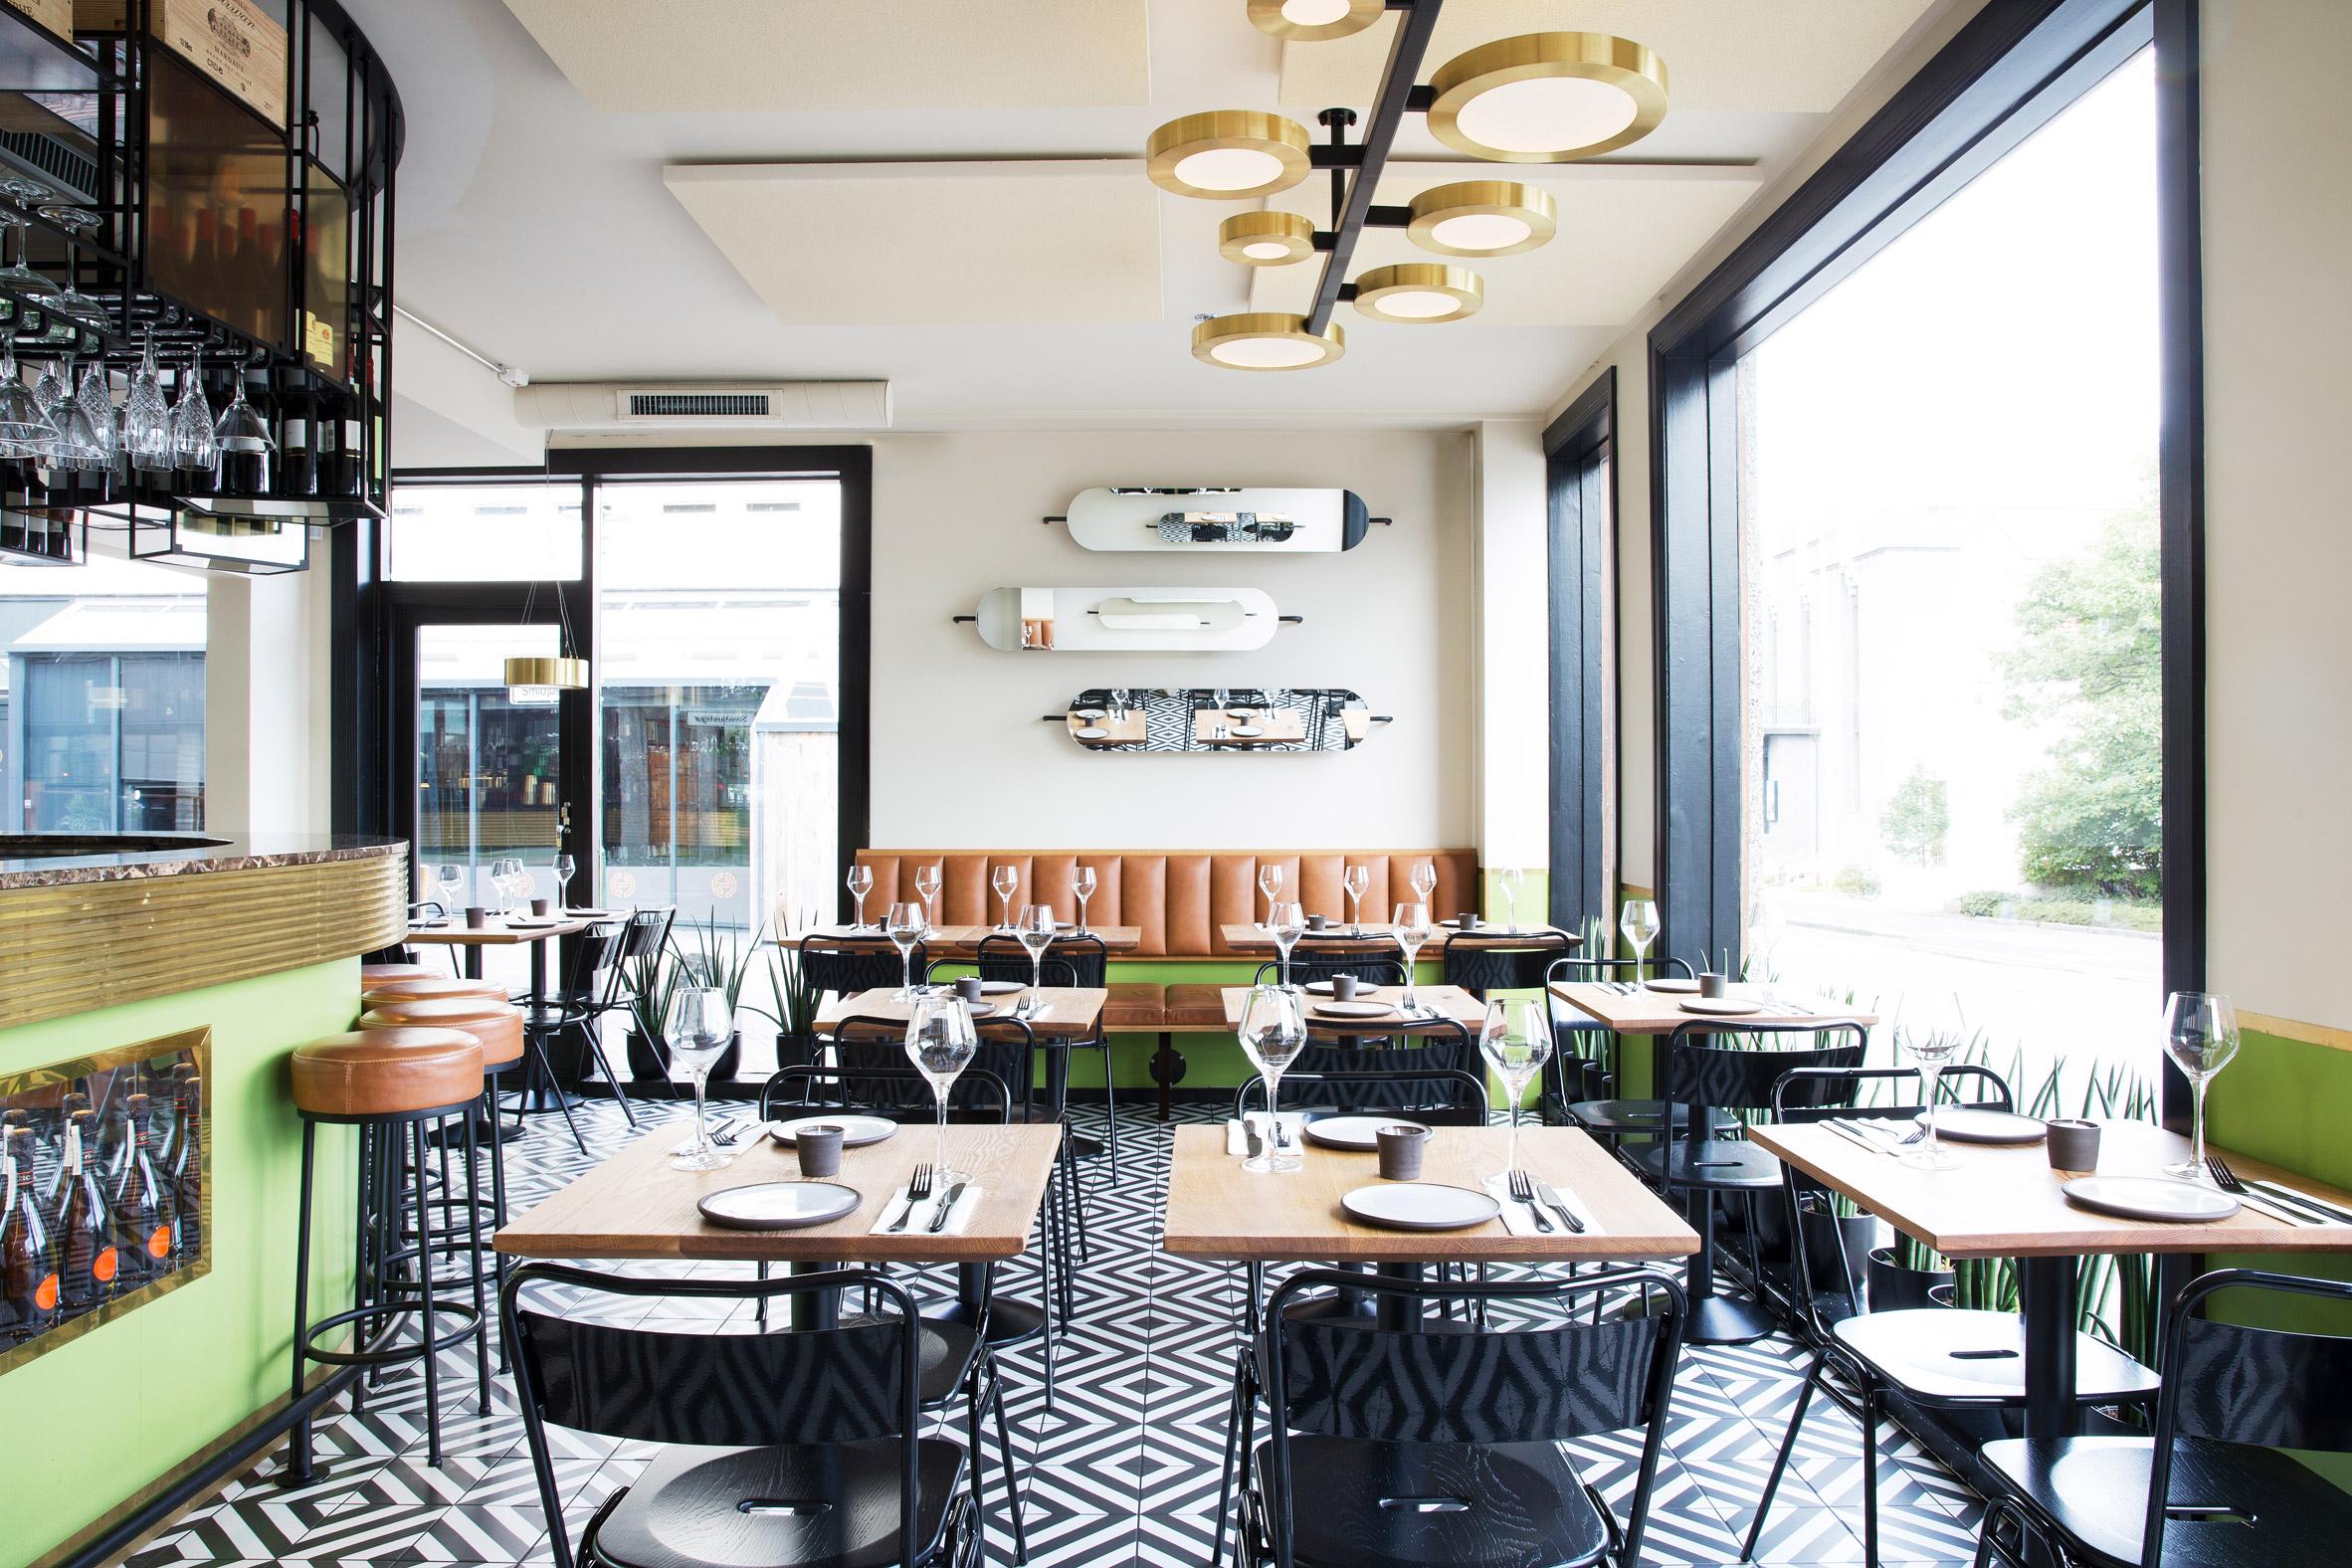 mat-bar-haf-studio-reykjavik-iceland-restaurant_dezeen_2364_col_1.jpg